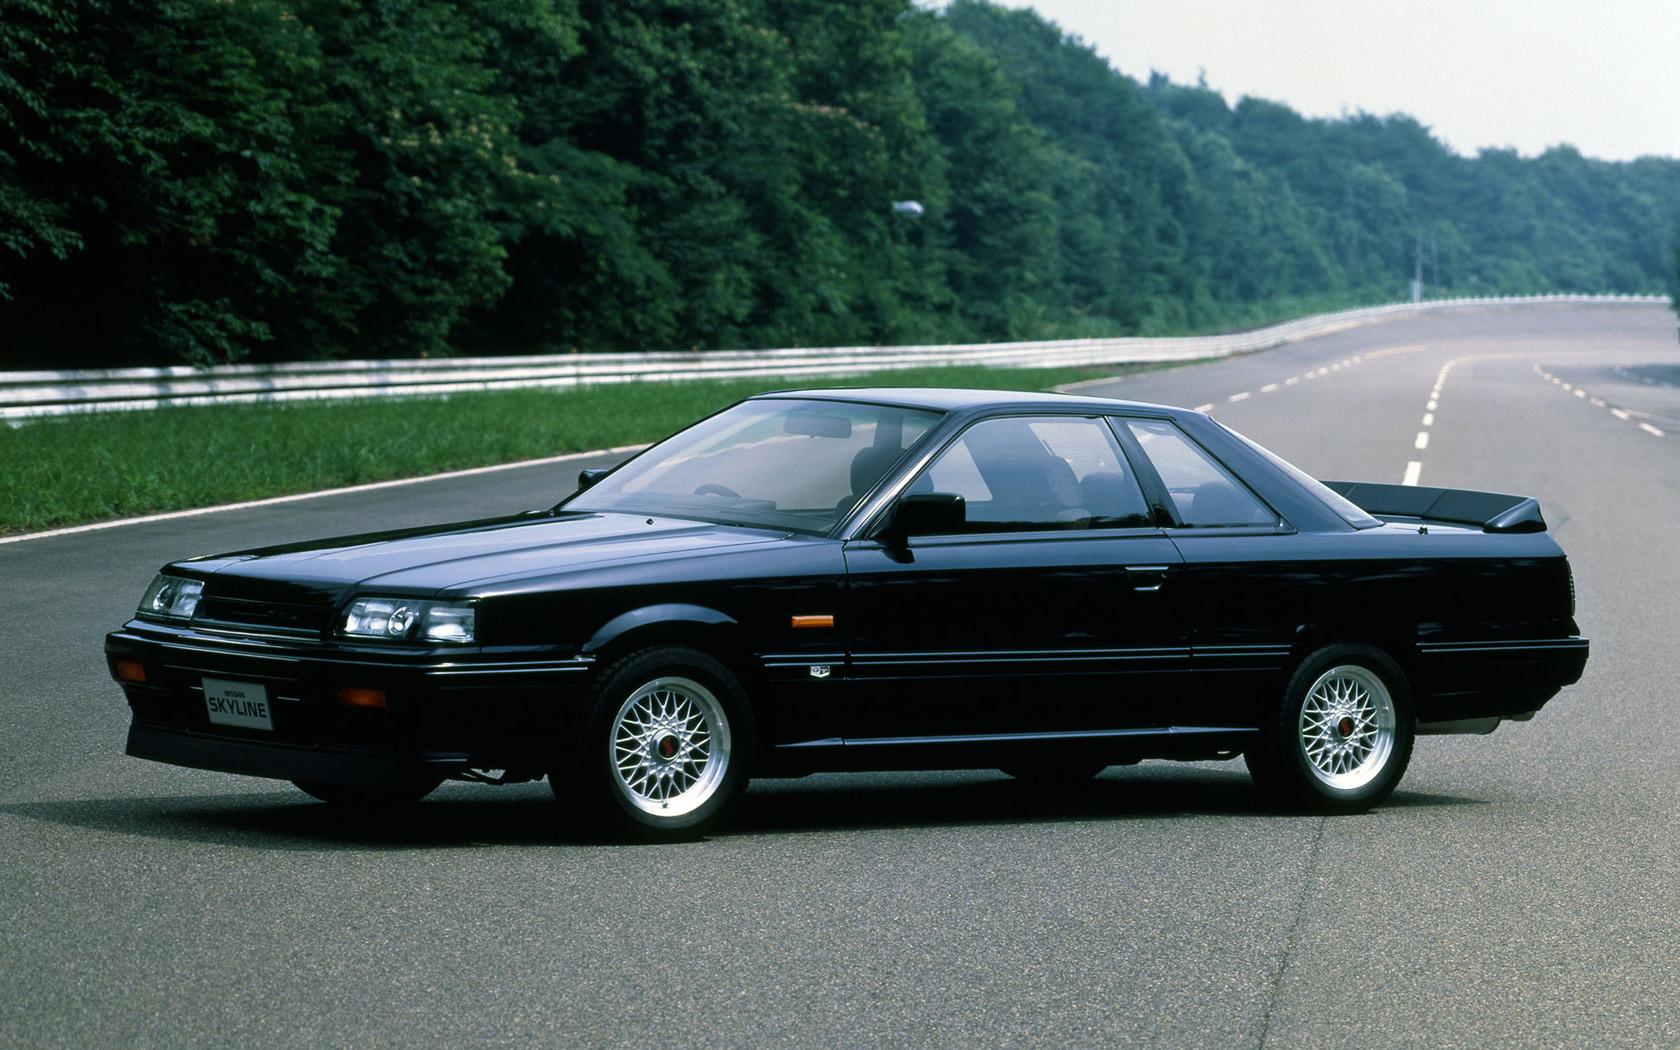 1987 R31 Nissan Skyline Gts R Free Widescreen Wallpaper